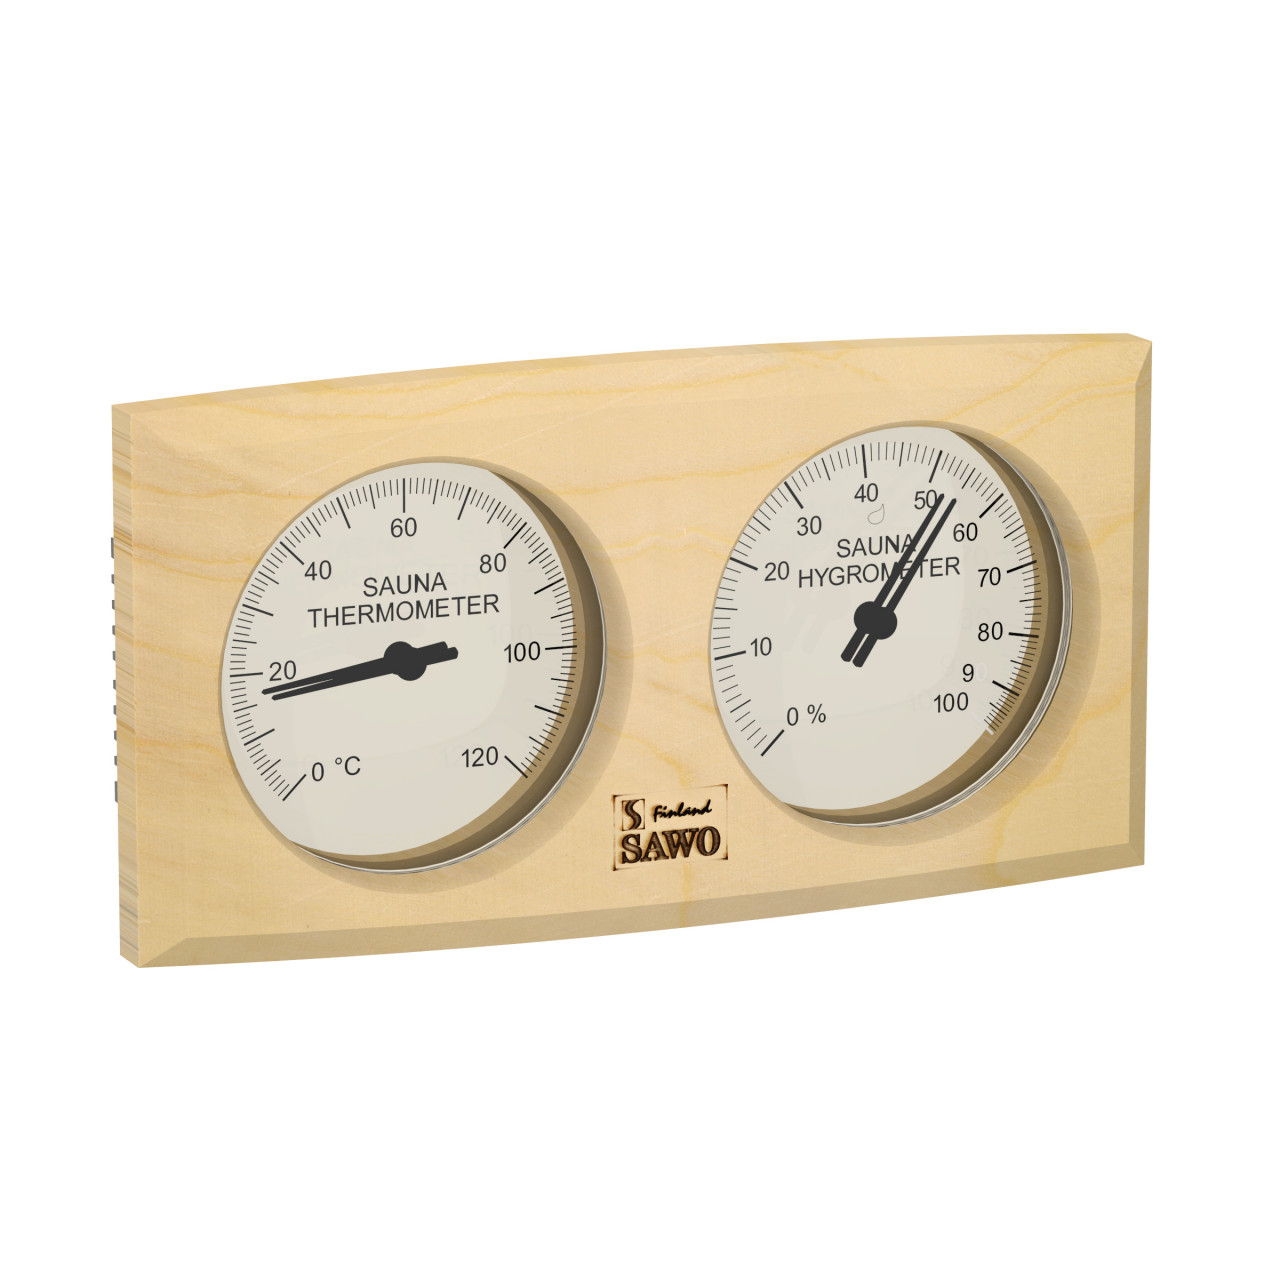 Sawo OVAL thermo-hygrometer